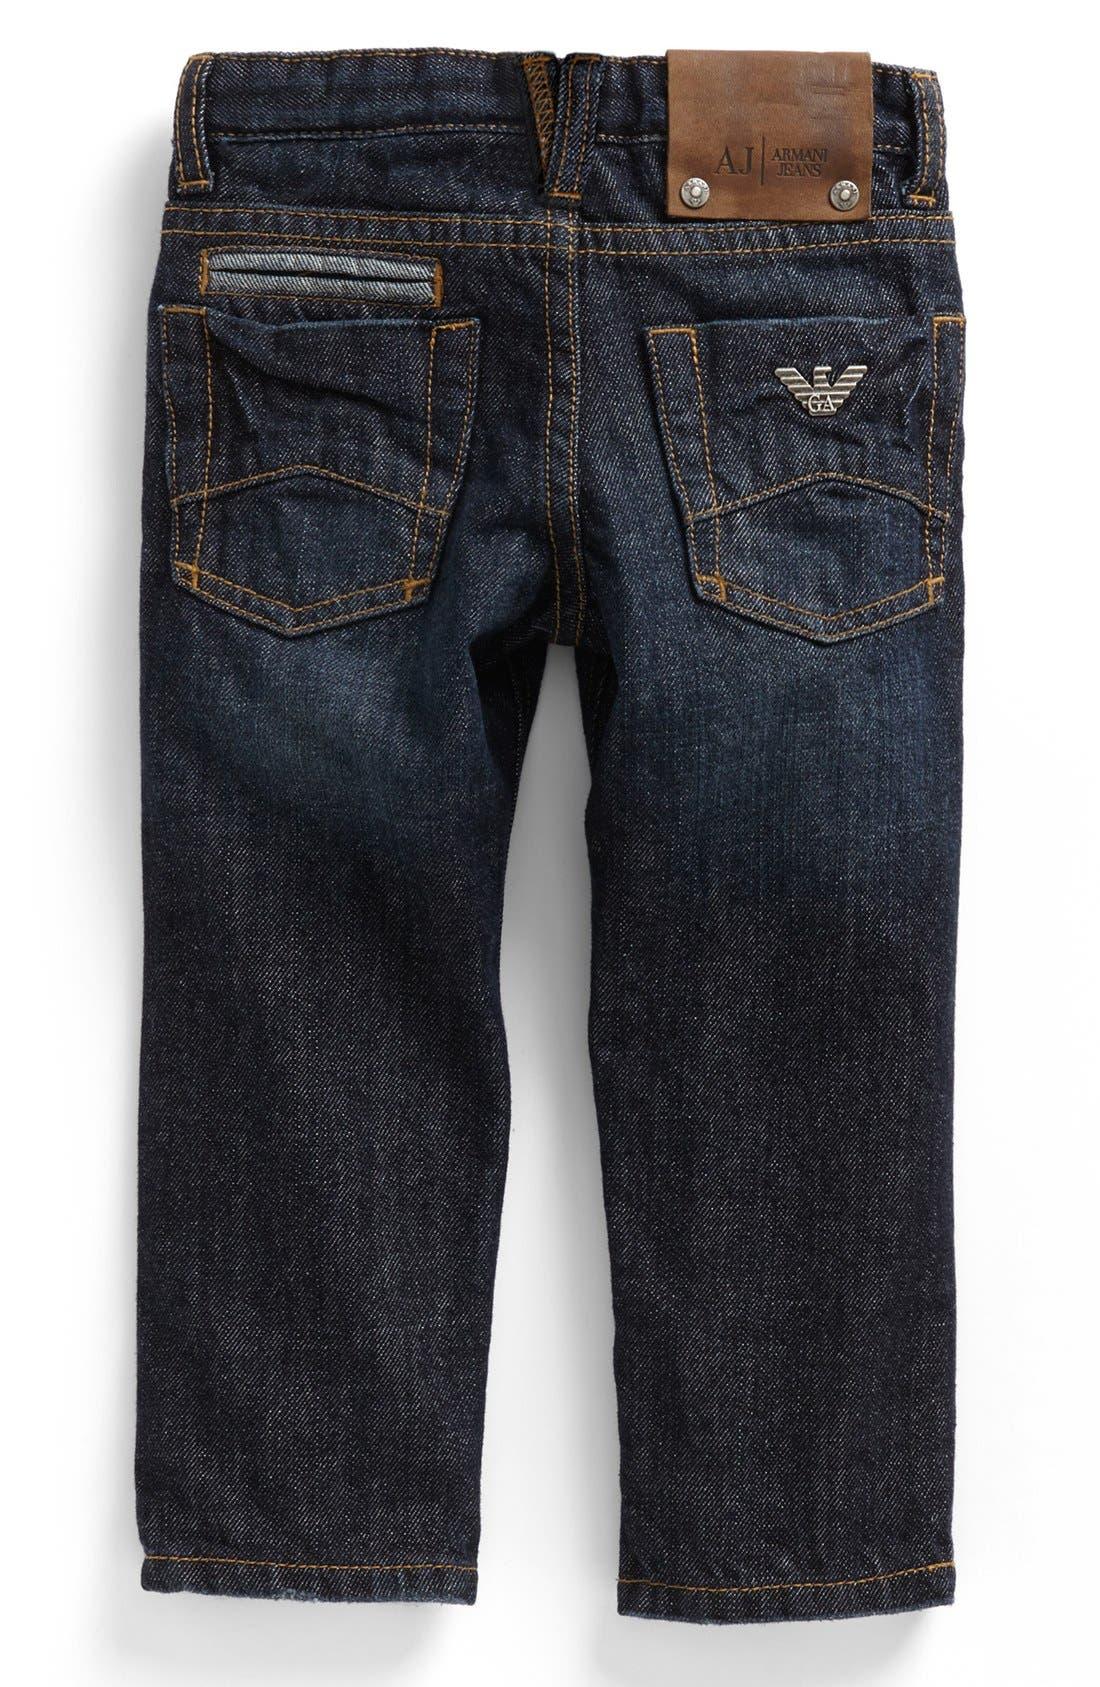 Alternate Image 1 Selected - Armani Junior Straight Leg Jeans (Toddler Boys, Little Boys & Big Boys)